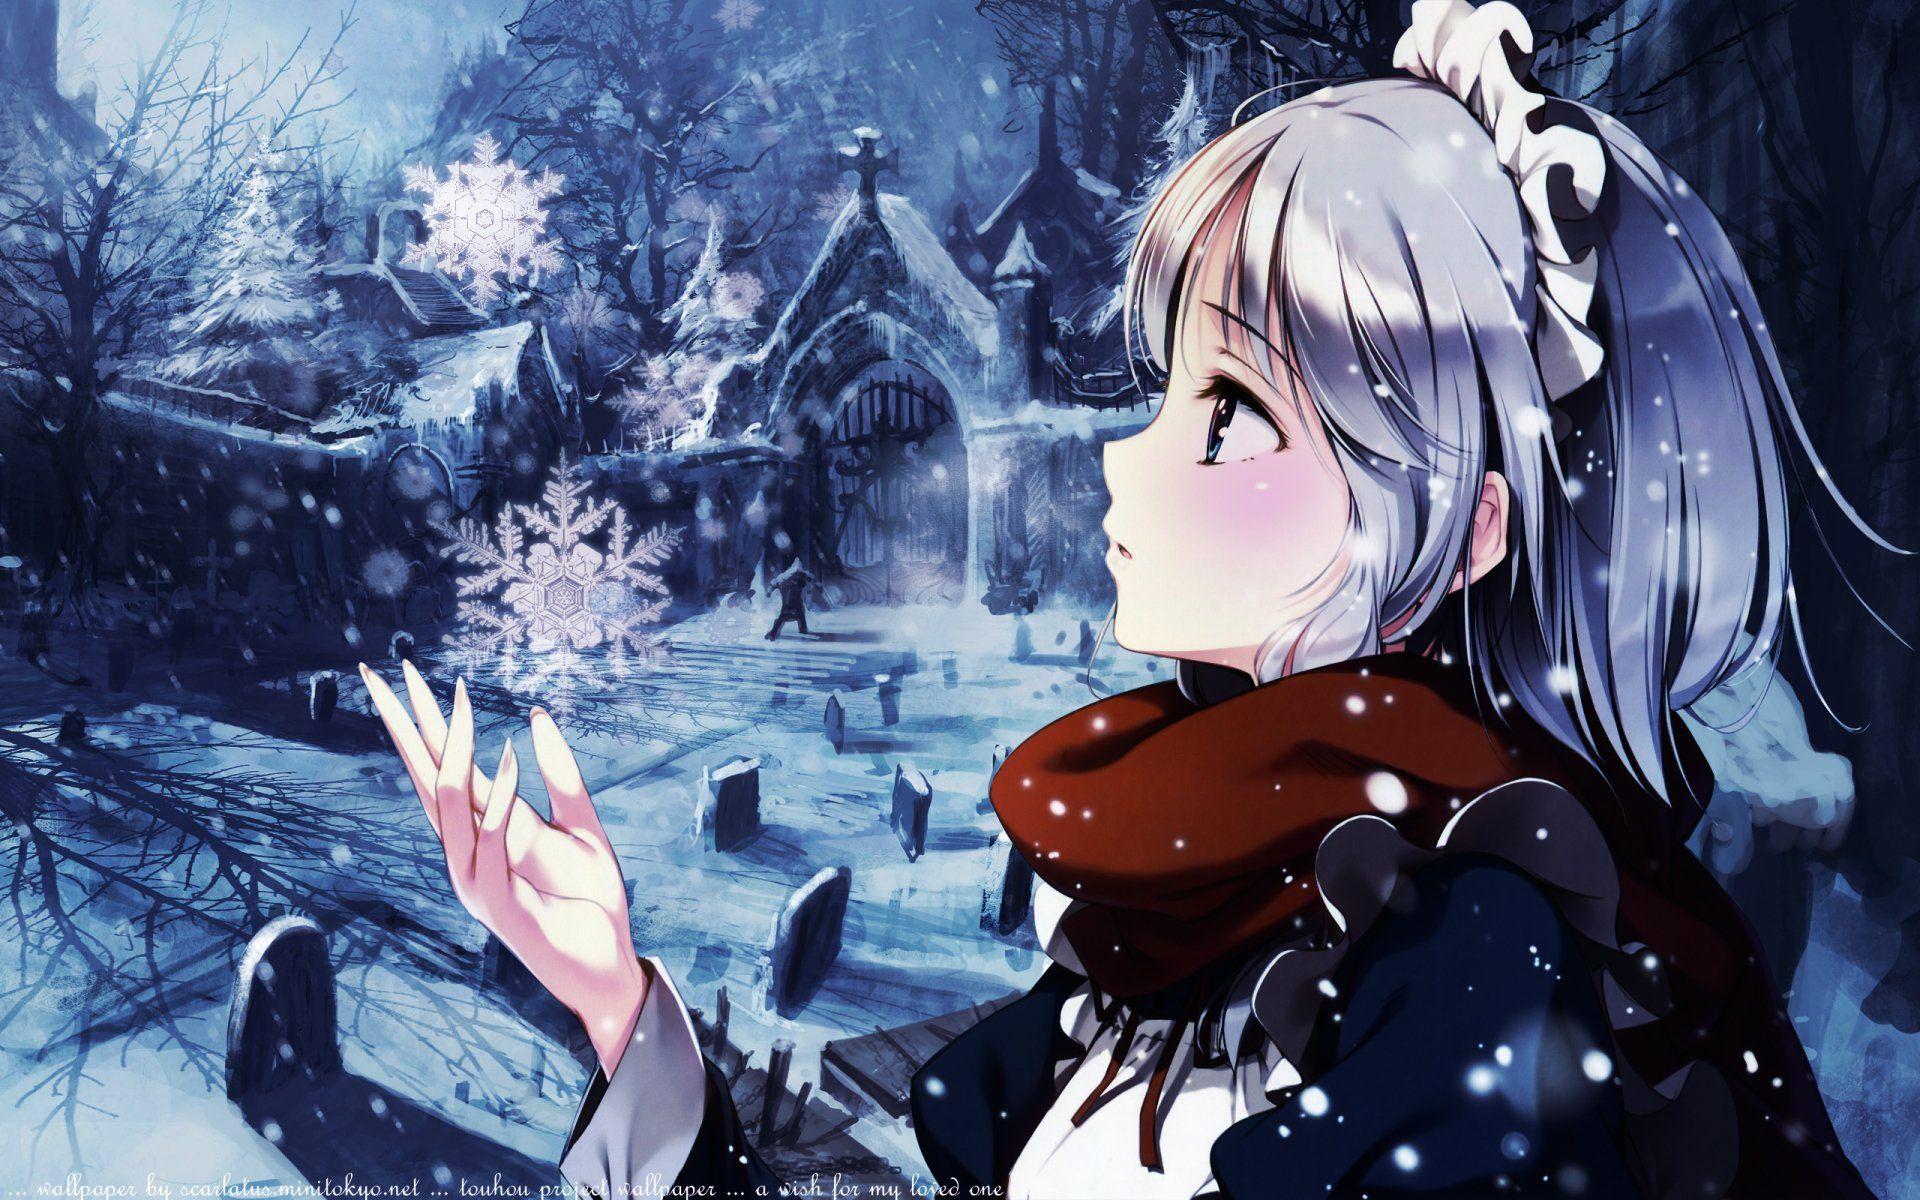 anime touhou sakuya izayoi wallpaper | 東方 (touhou project